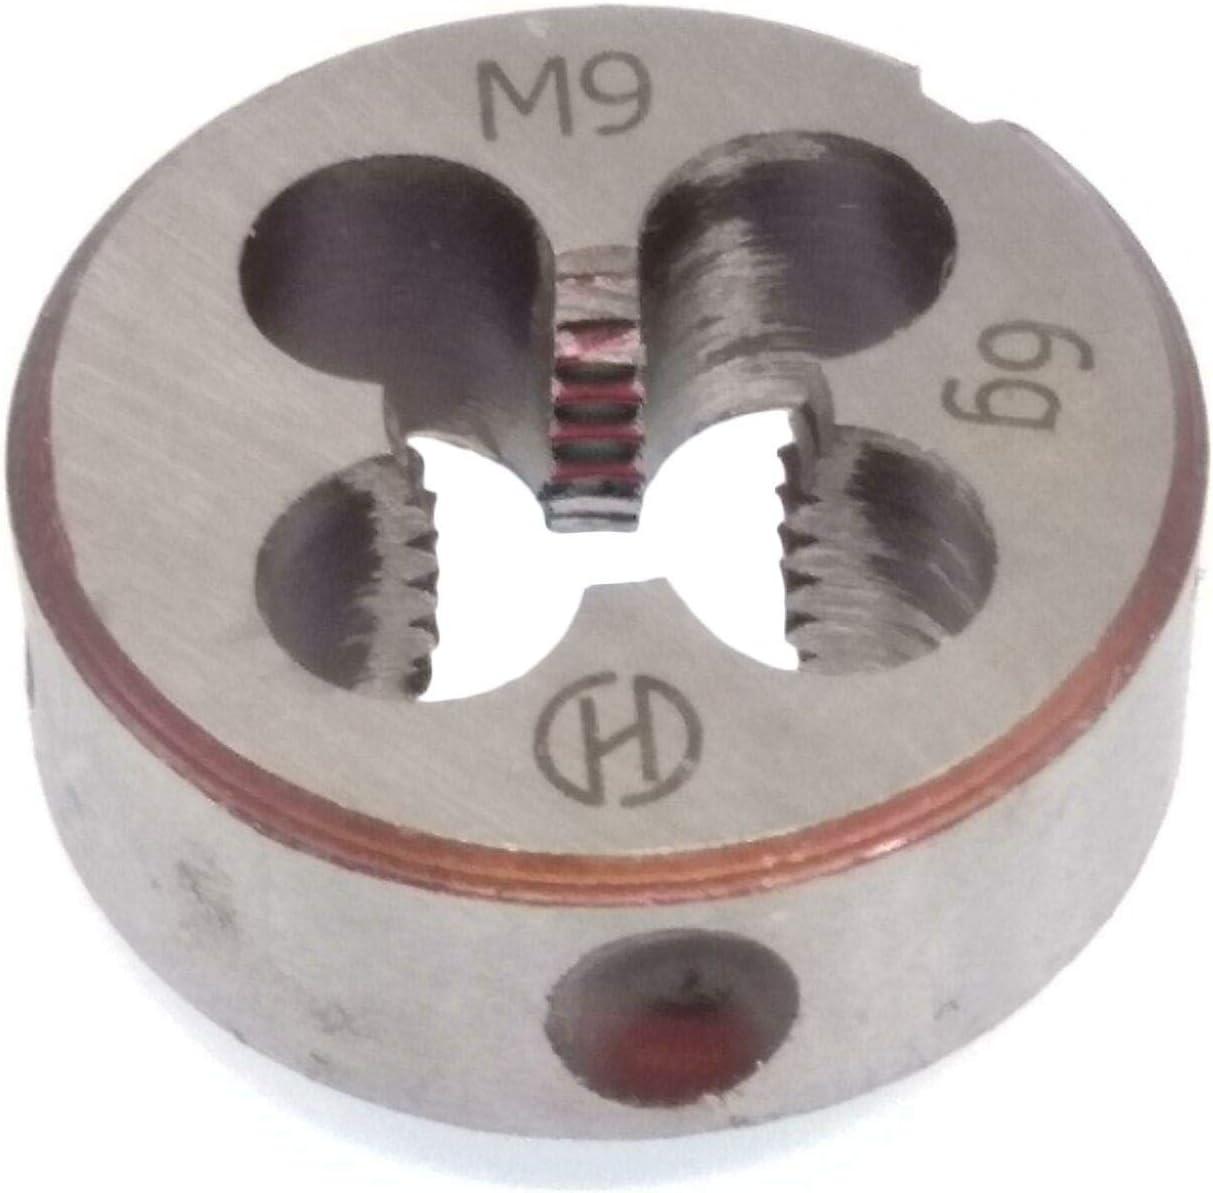 Yodaoke HSS 9mm x 1.25 Metric Die Right Hand Thread M9 x 1.25mm Pitch